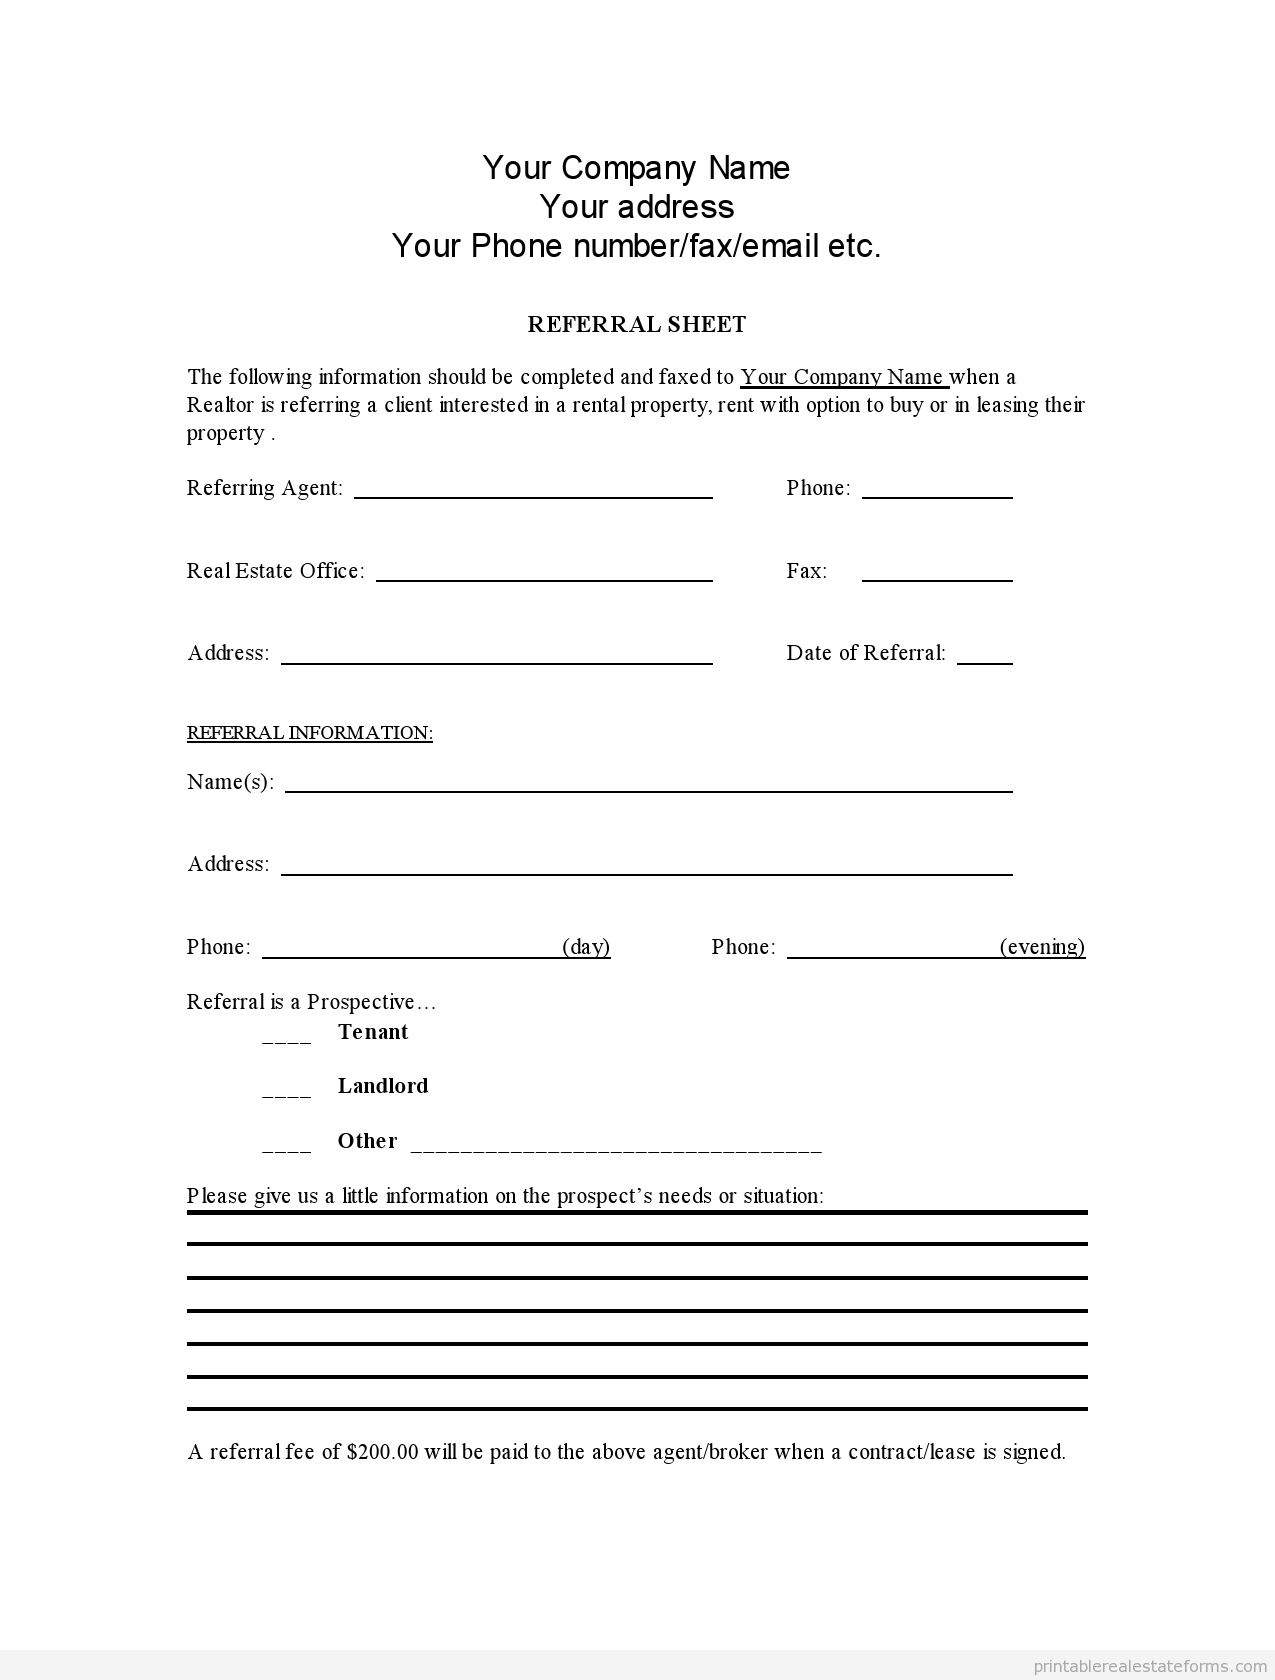 Sample Printable Referral Sheet For Realtors Form